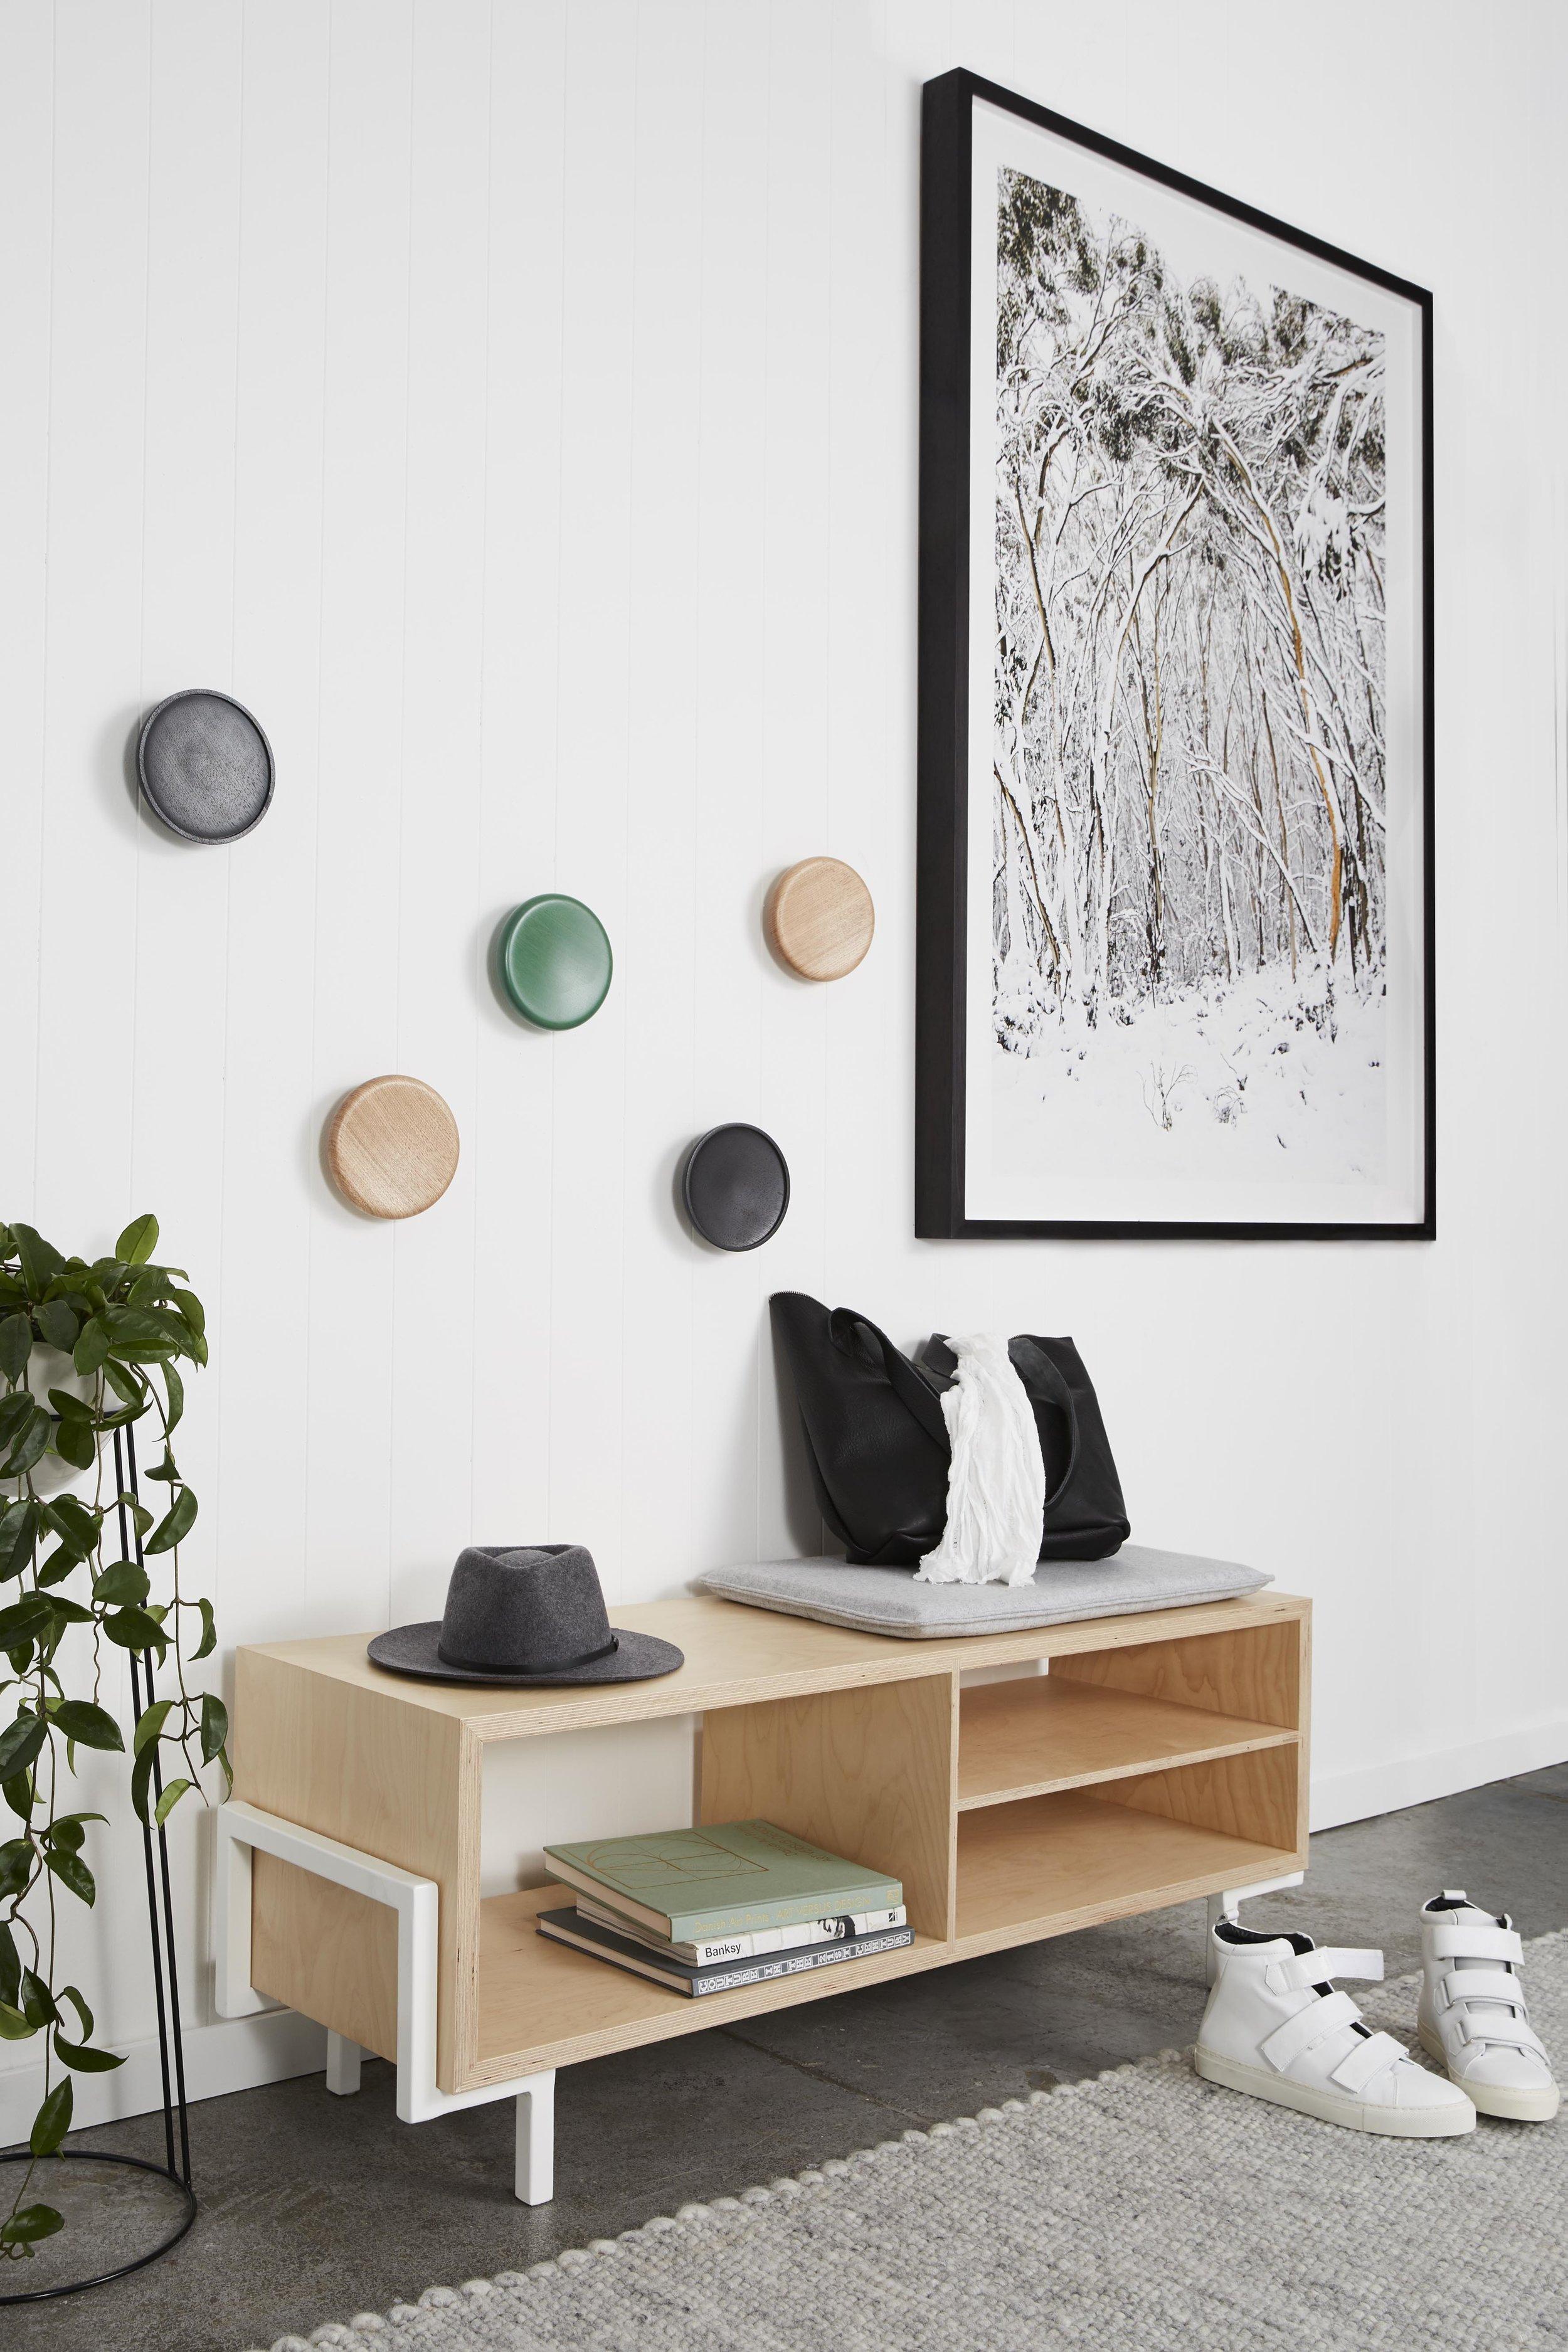 Maitland Street Interiors, Sarah Elshaug, Interior Stylist Melbourne, Felix Furniture Entry